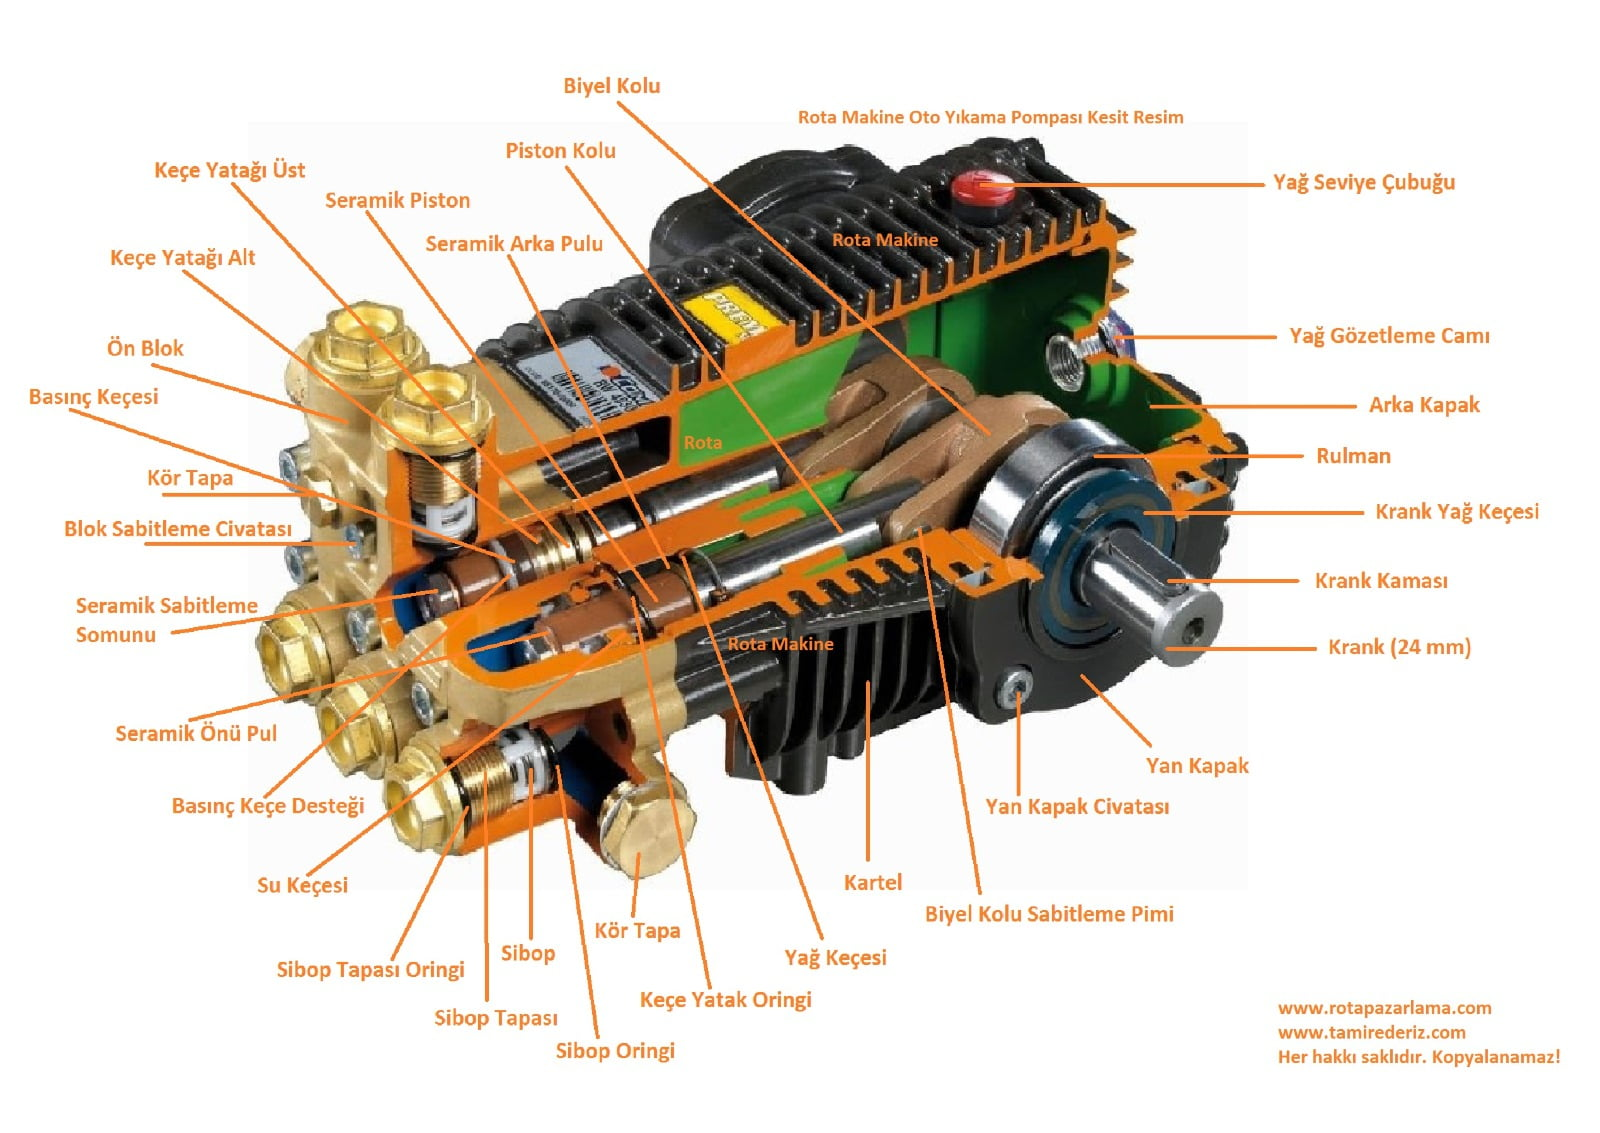 yikama-pompasi-kesit-comet-1